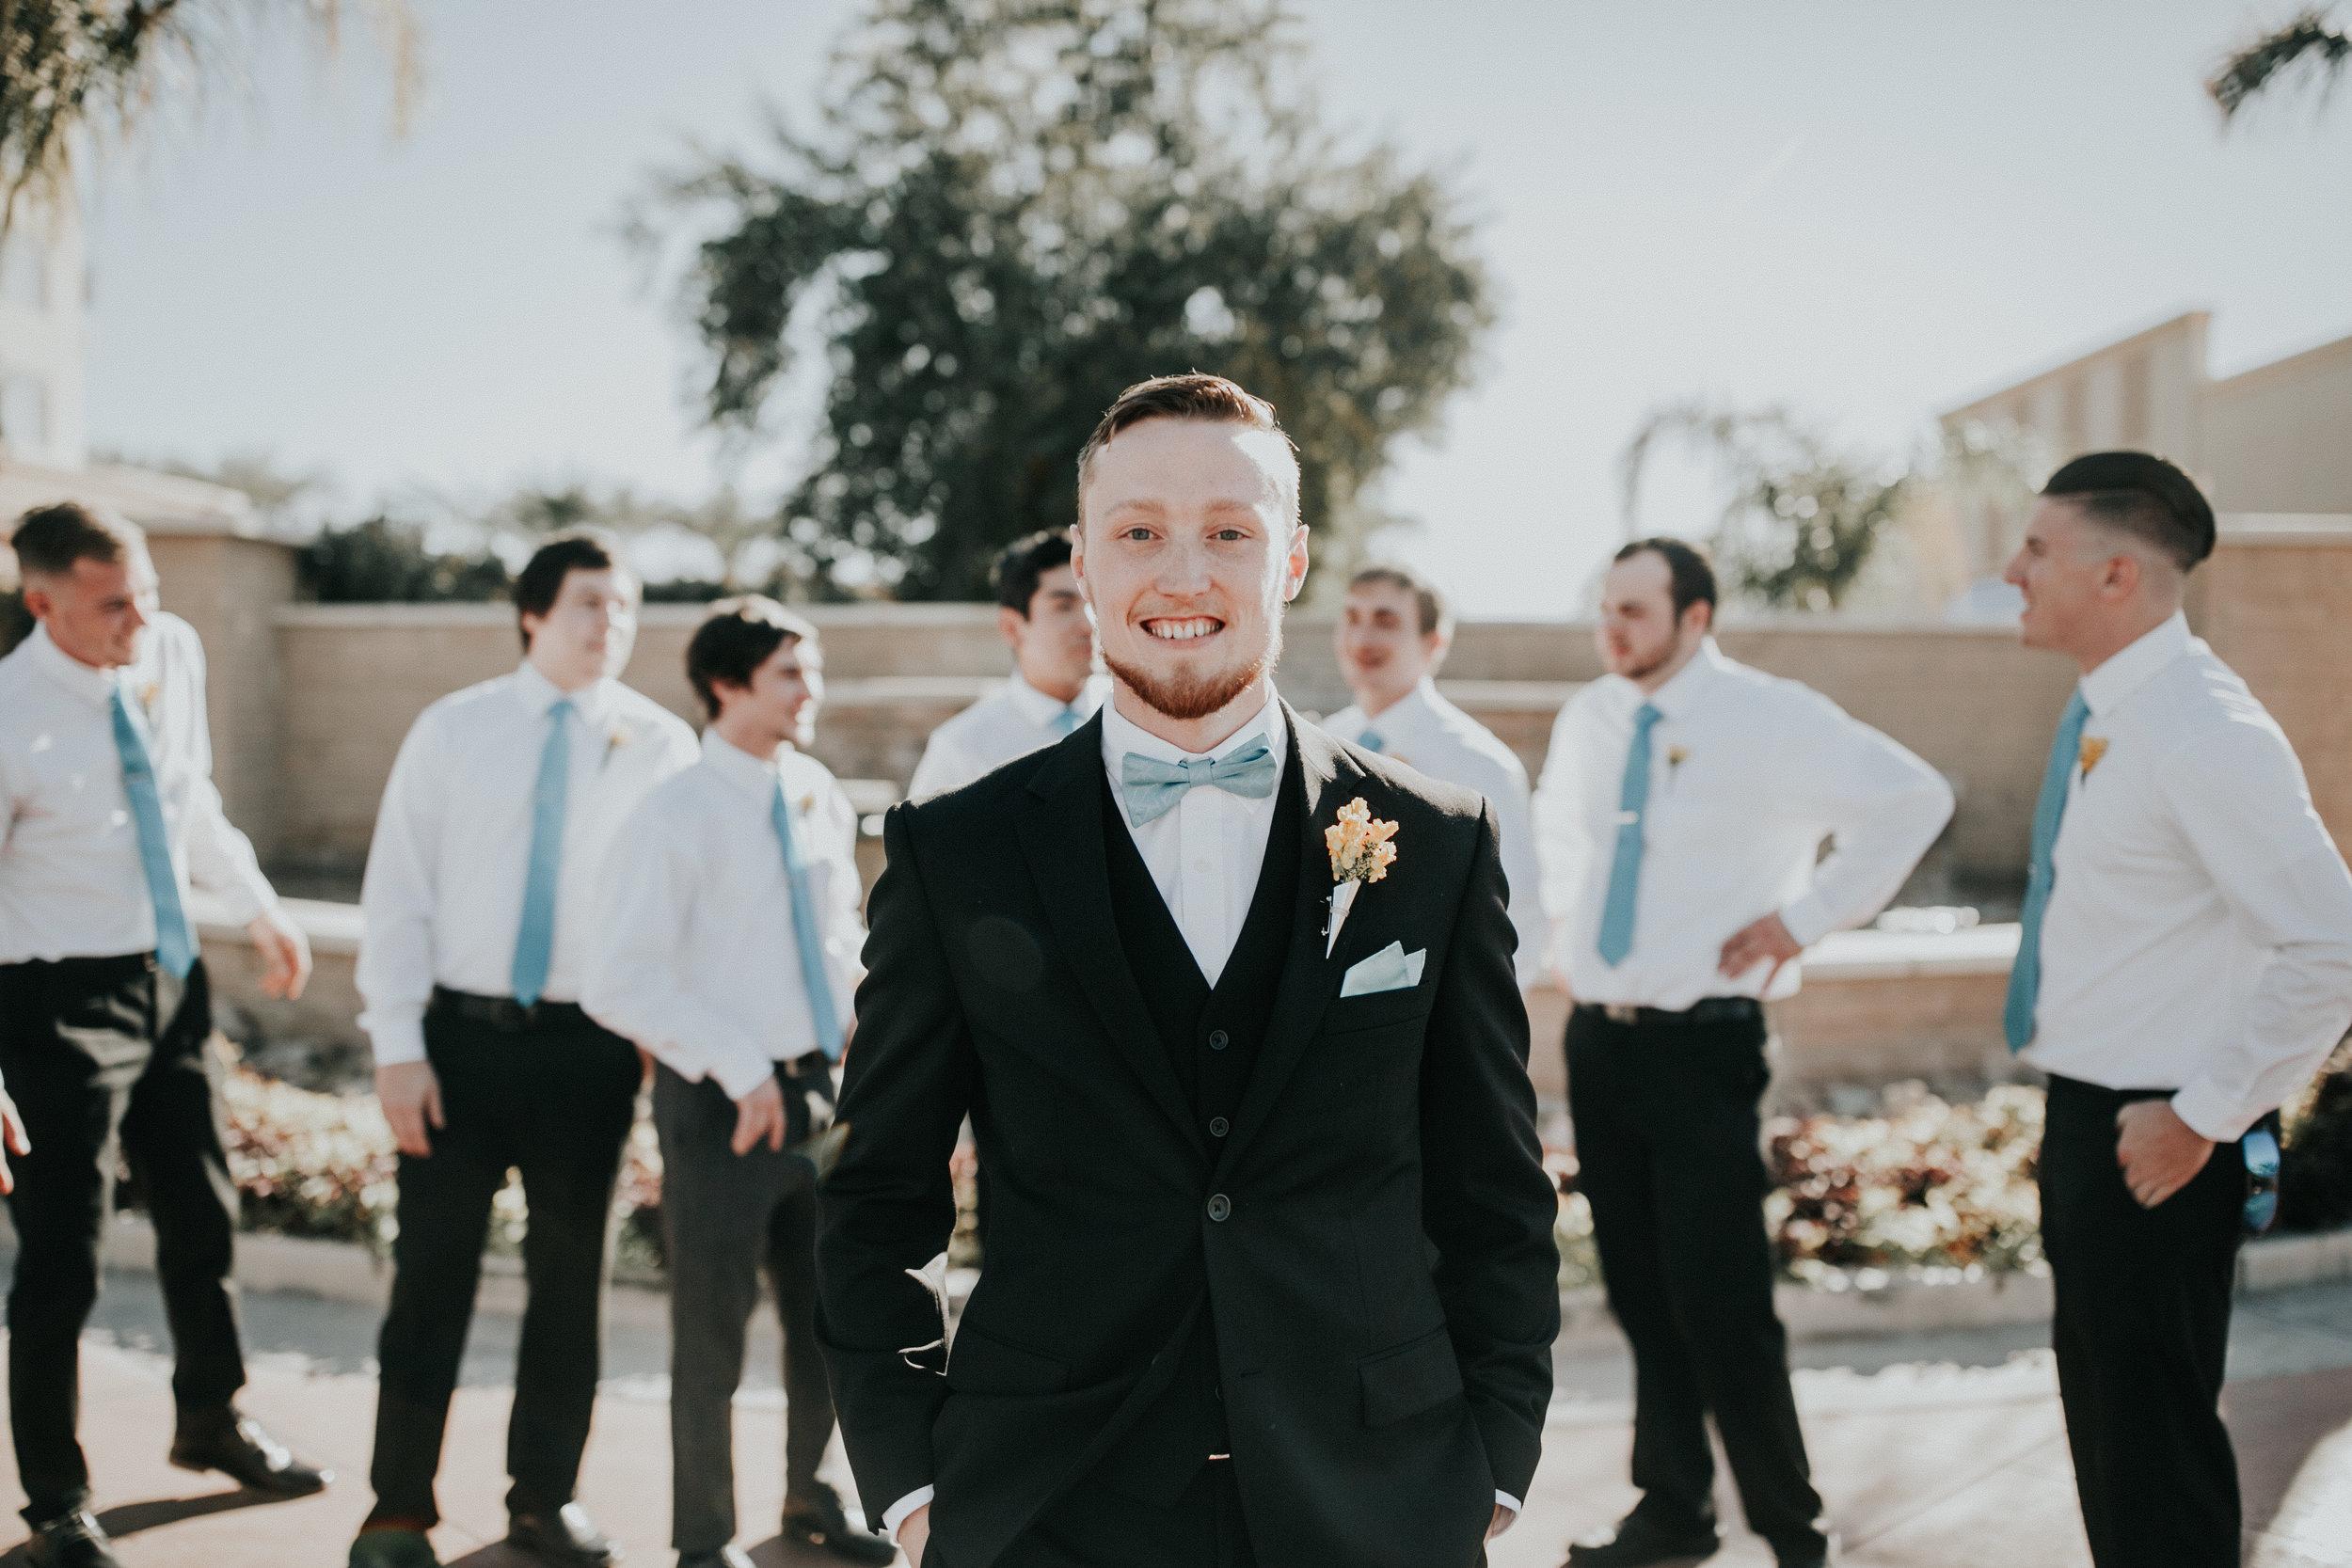 adventure-wedding-photographer-gracetphotography-19.jpg